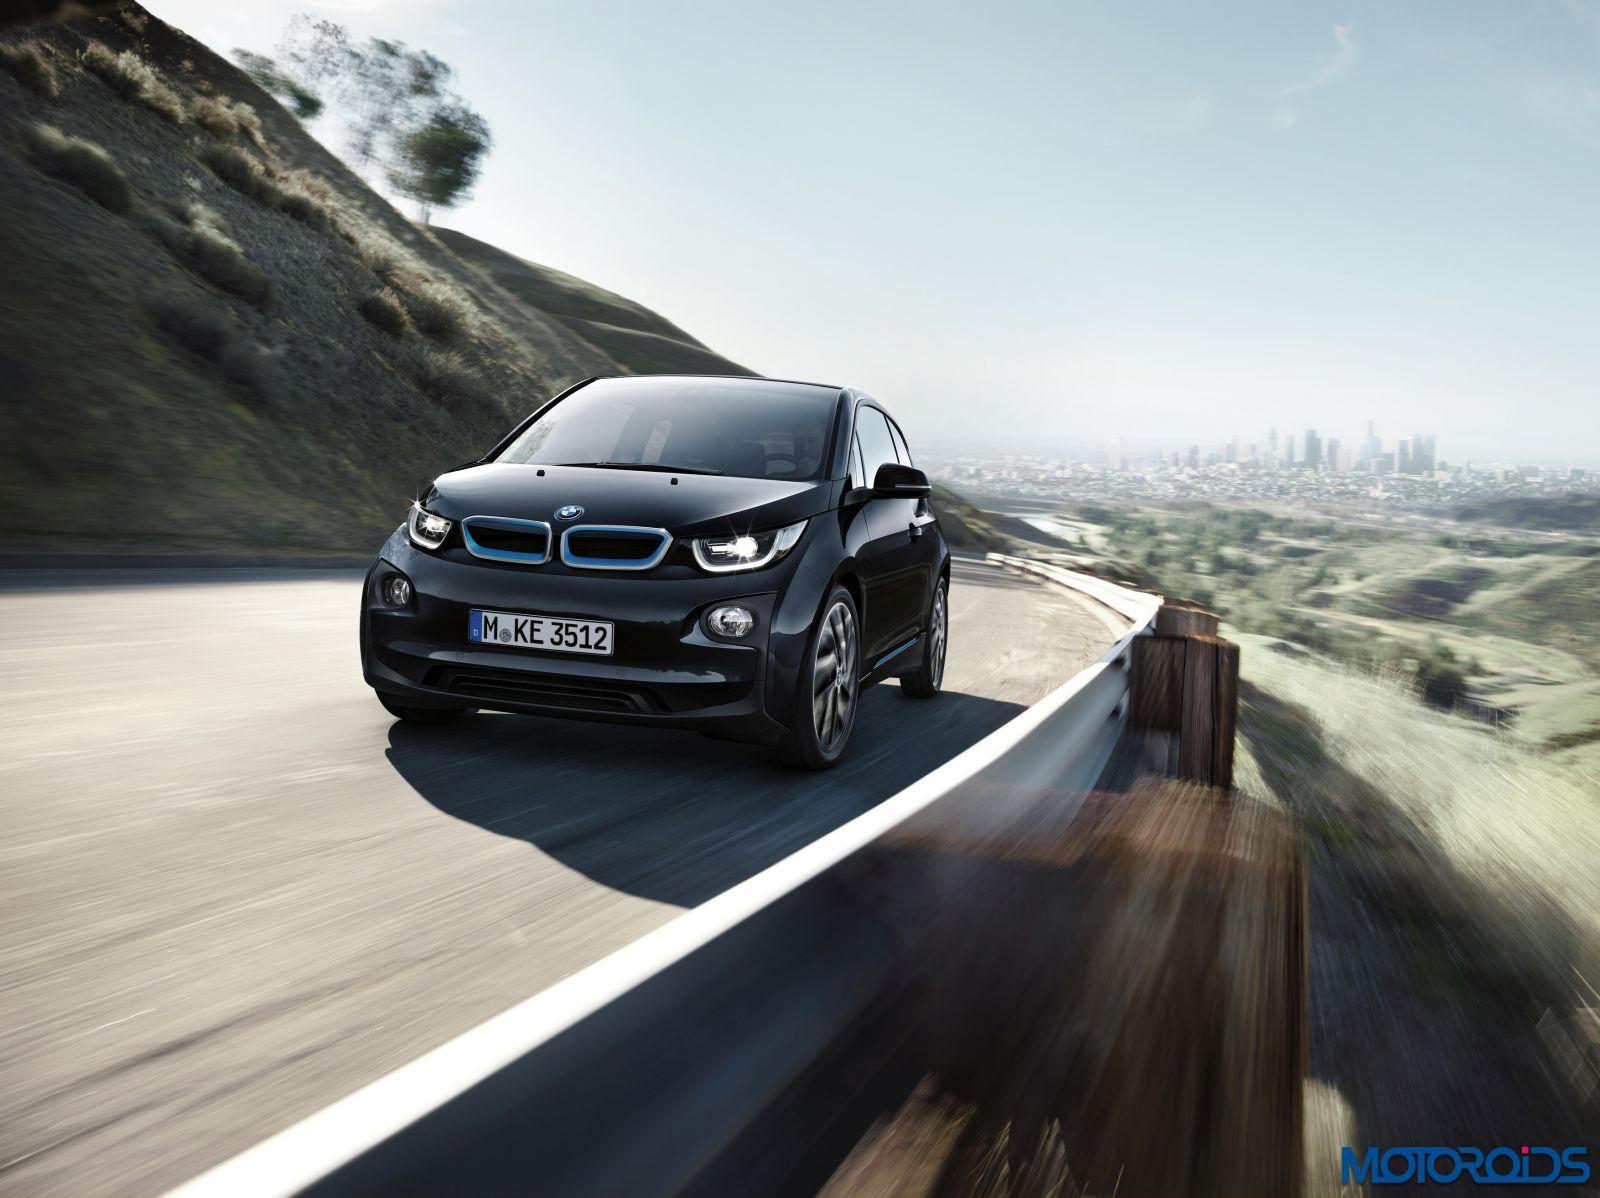 2016-BMW-i3-Official-Images-26